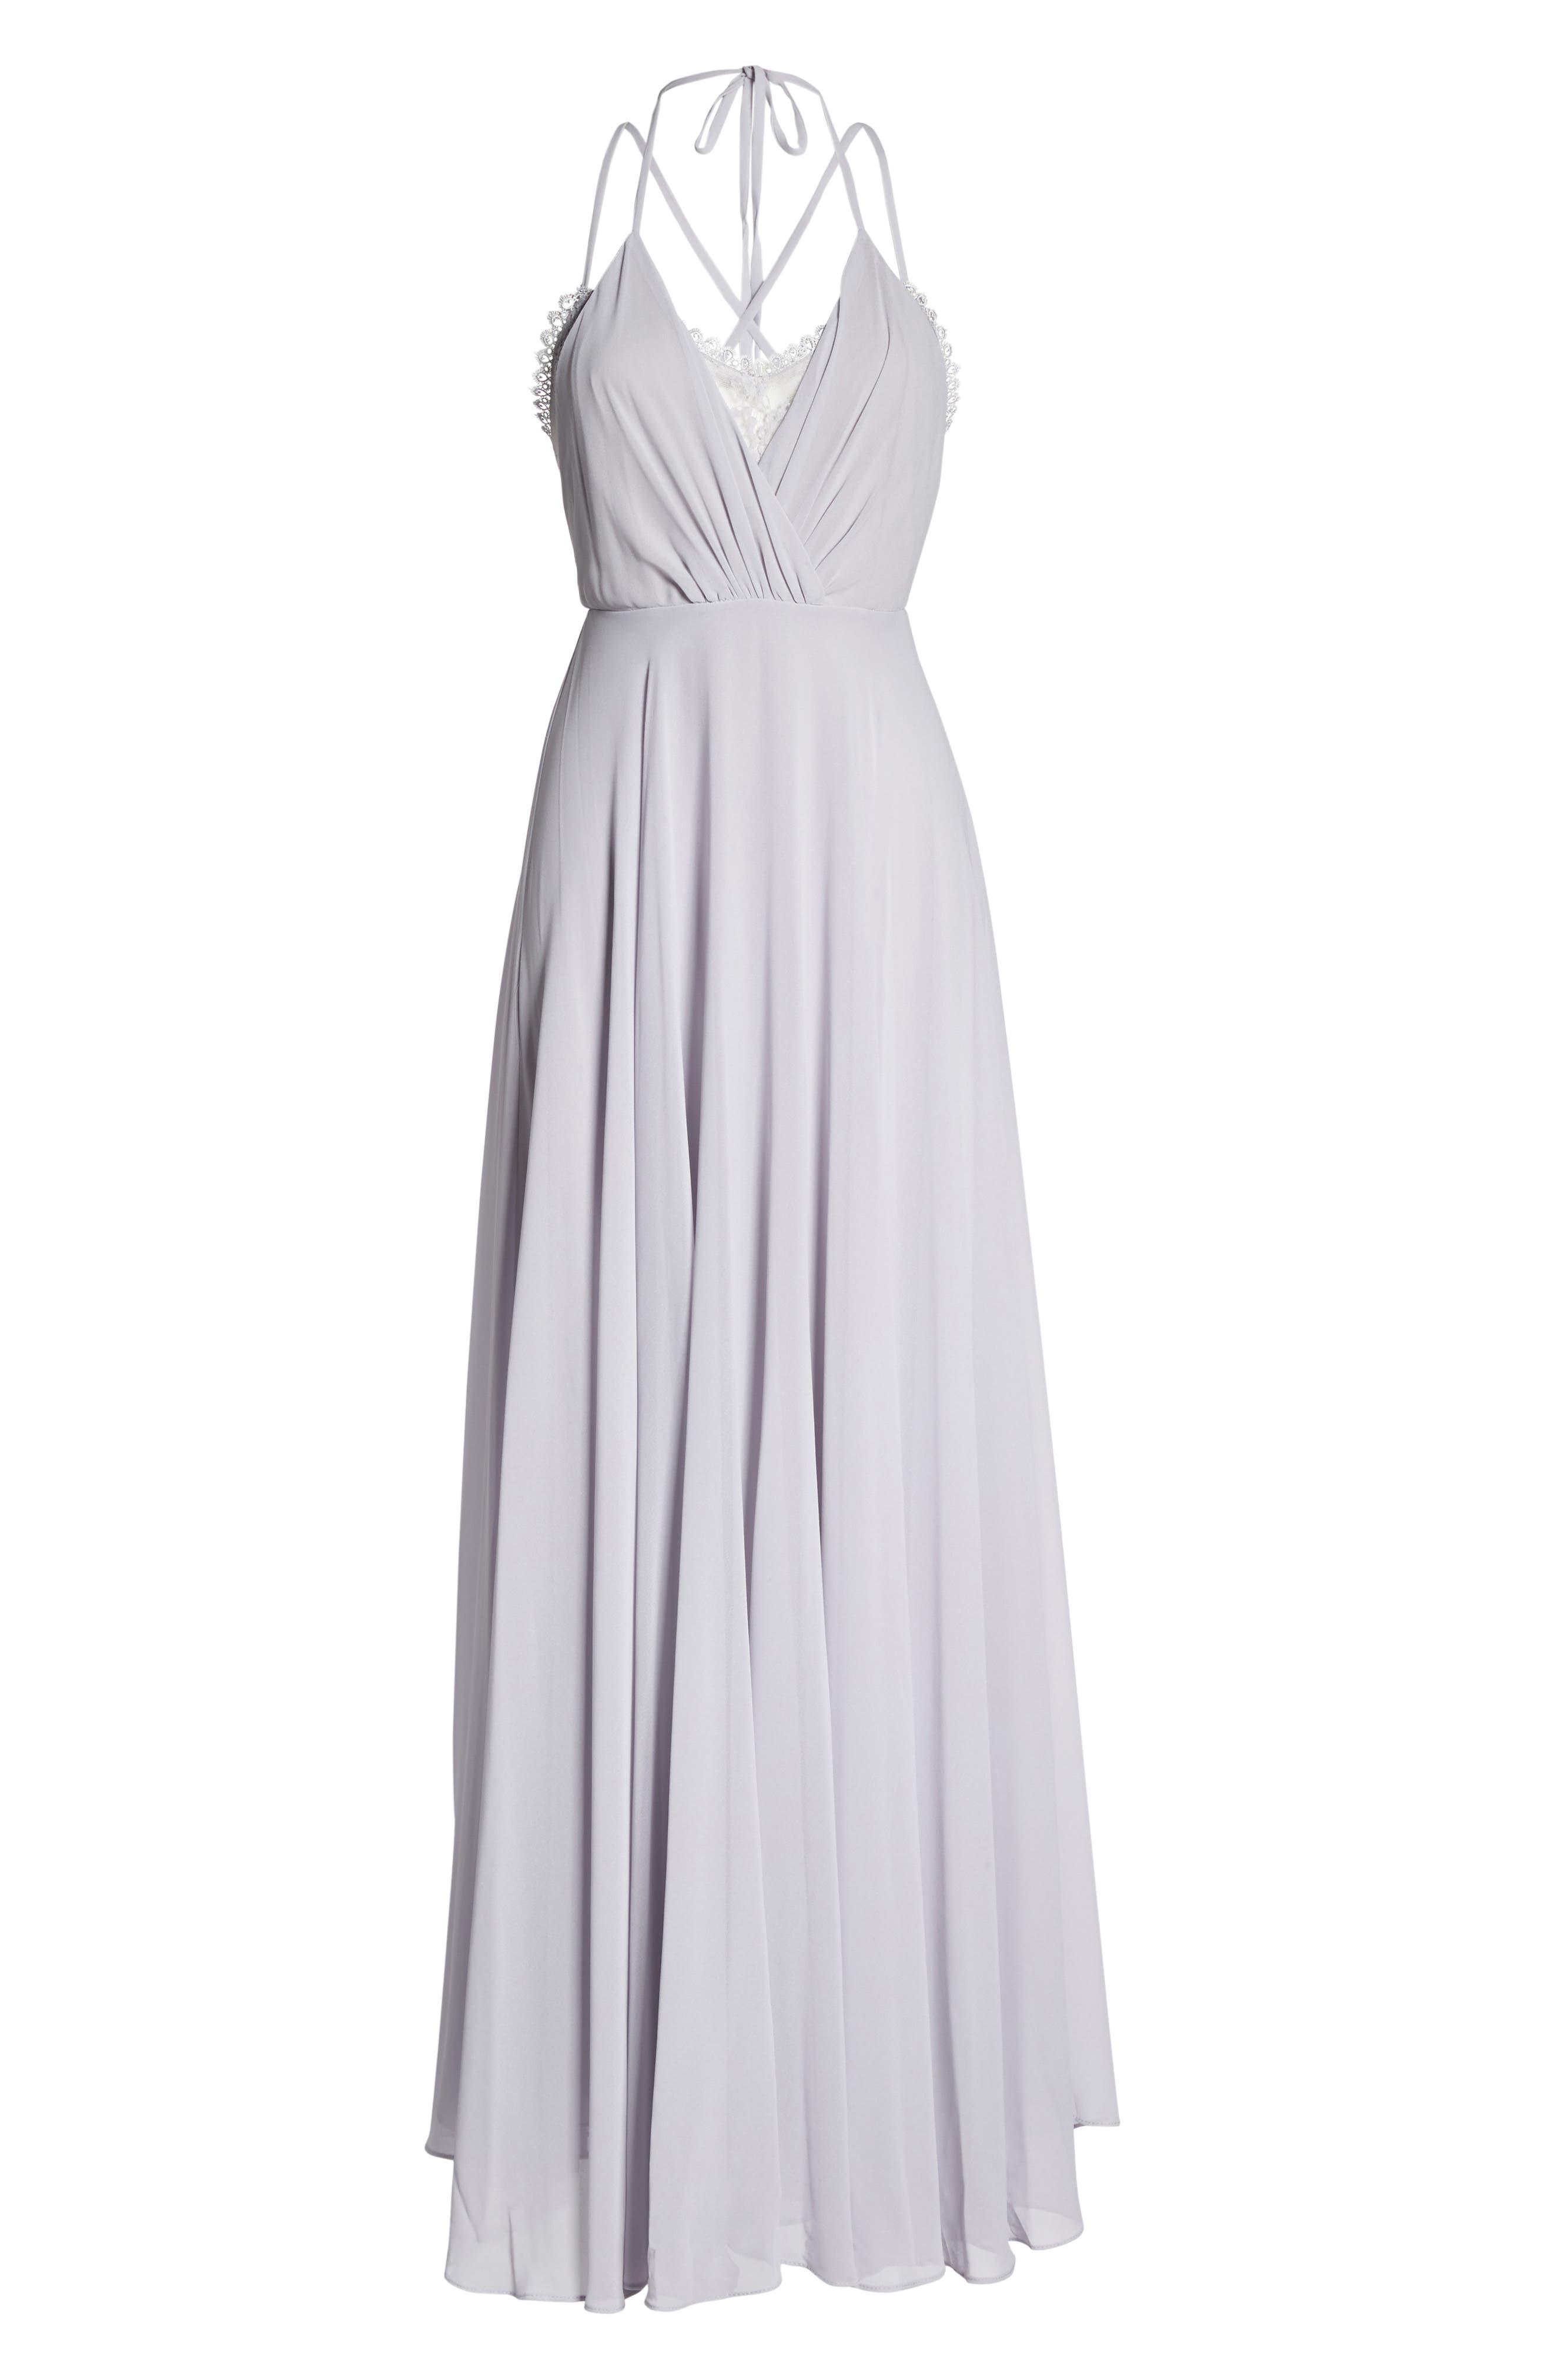 Celebrate the Moment Lace Trim Chiffon Maxi Dress,                             Alternate thumbnail 6, color,                             020